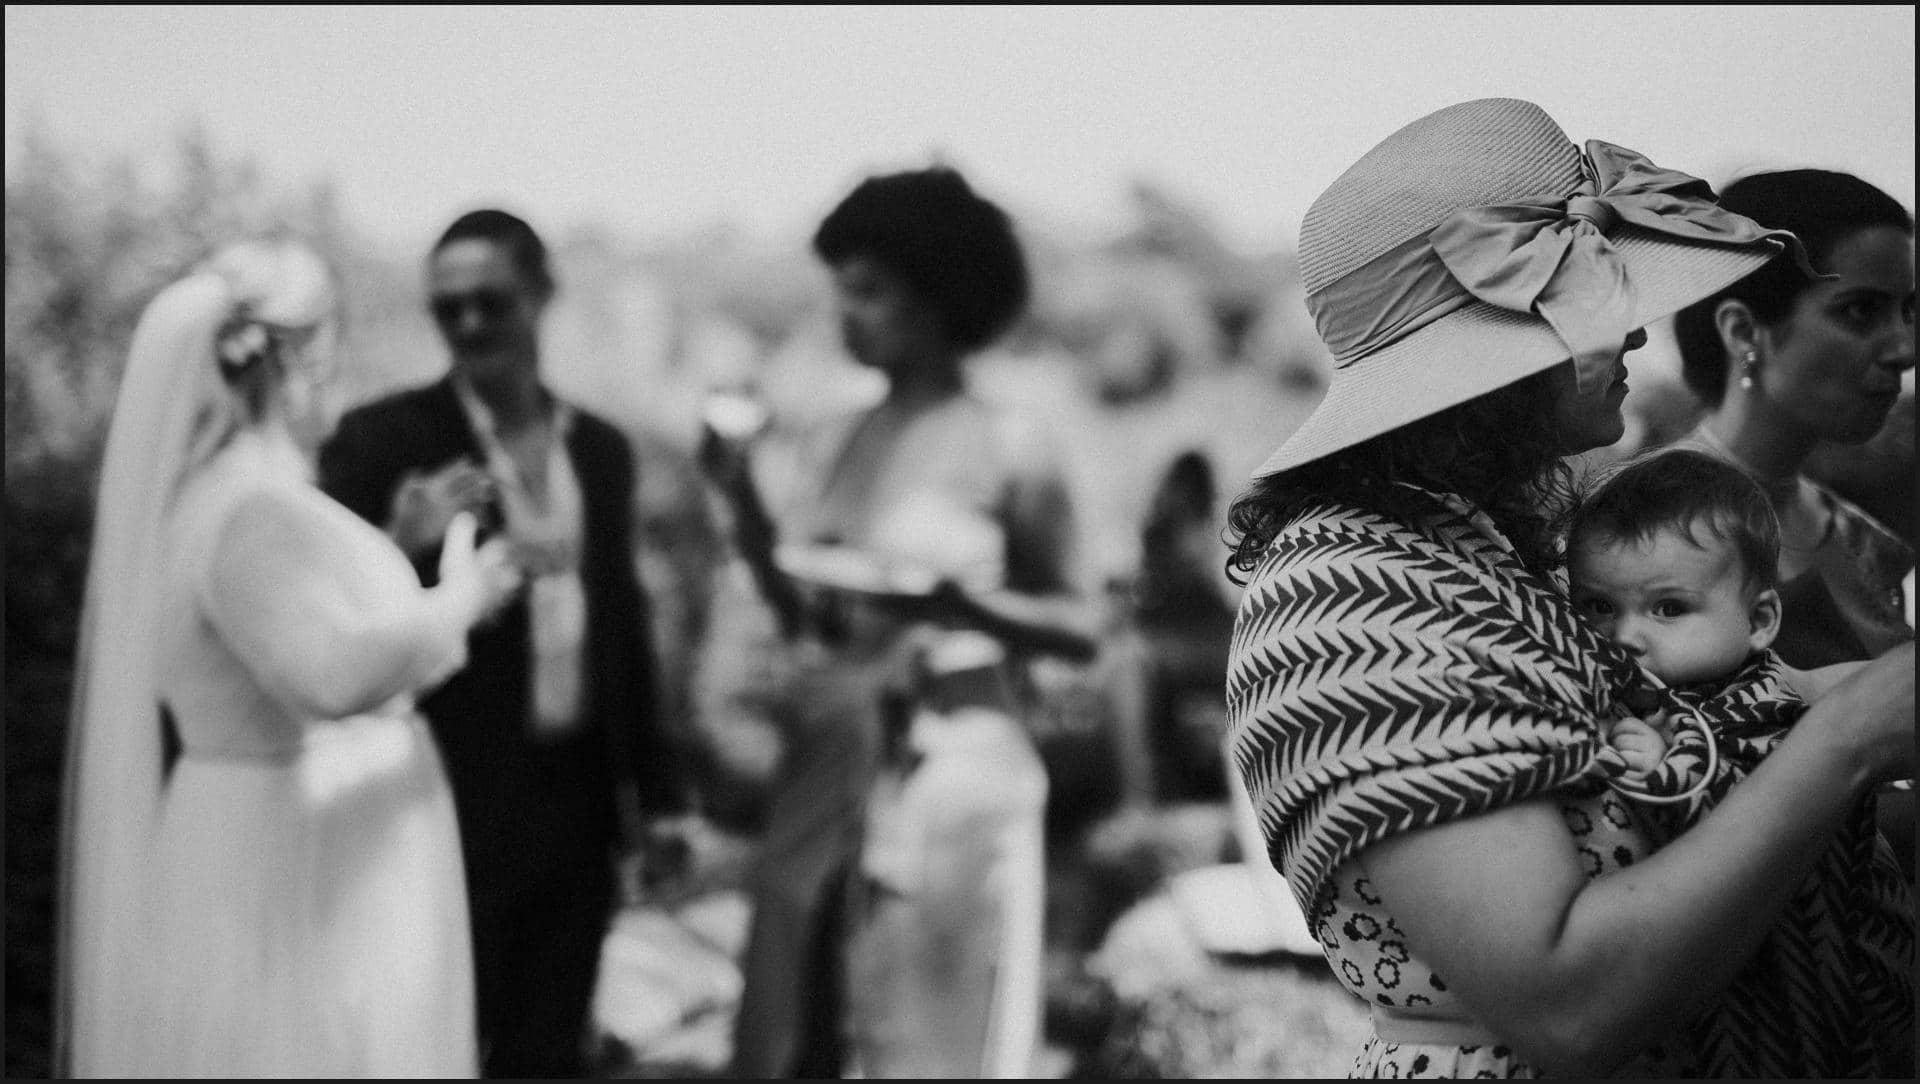 black and white, borgo di tragliata, wedding, rome, wedding in rome, italy wedding photographer, destination wedding in rome, rome wedding photographer